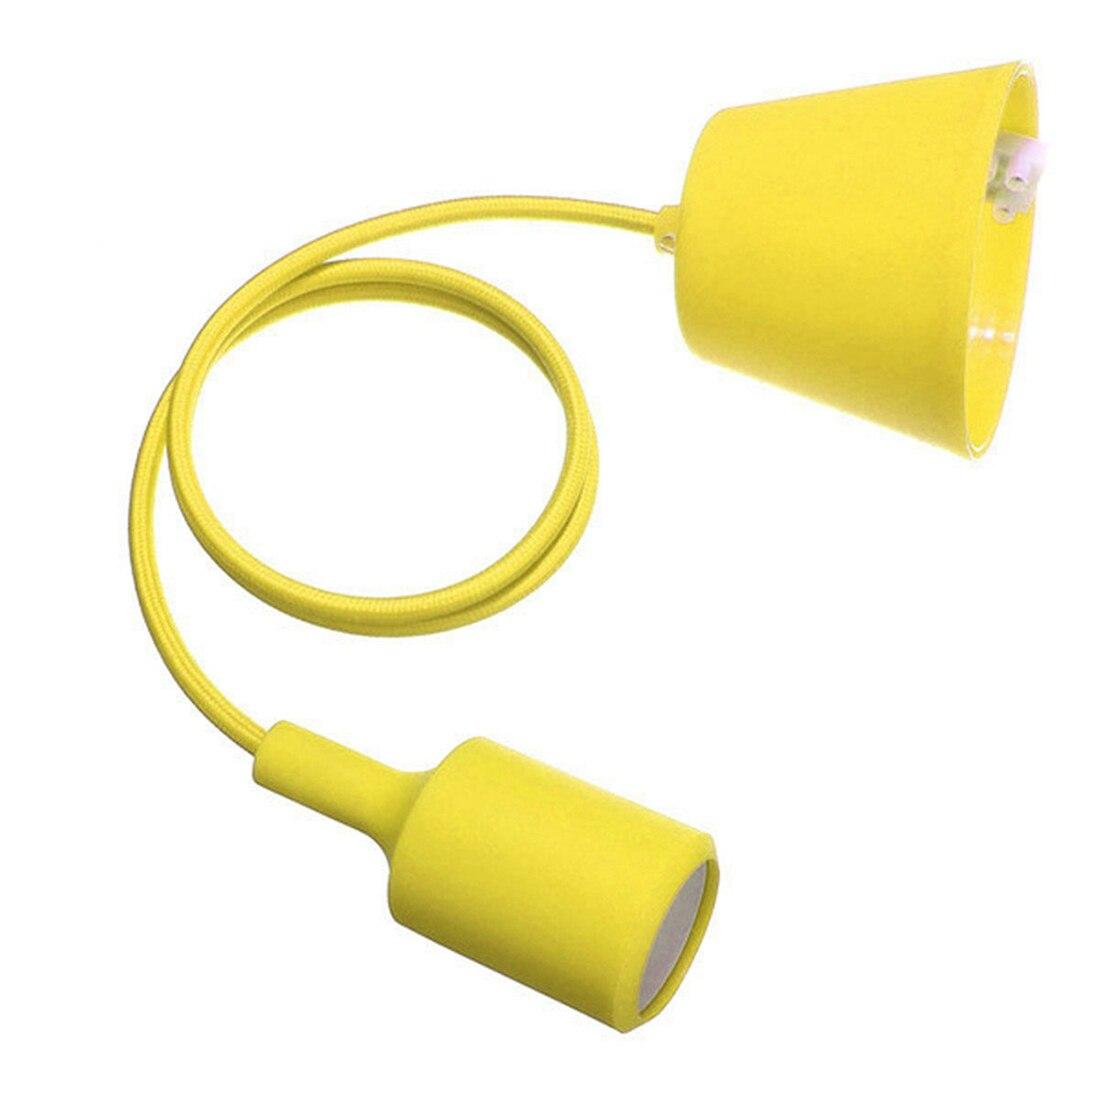 Yellow lamp base - E27 Silicone Rubber Mount Ceiling Lamp Bulb Lamp Cable Lamp Mount Diy Lamp Holder Lamp Base